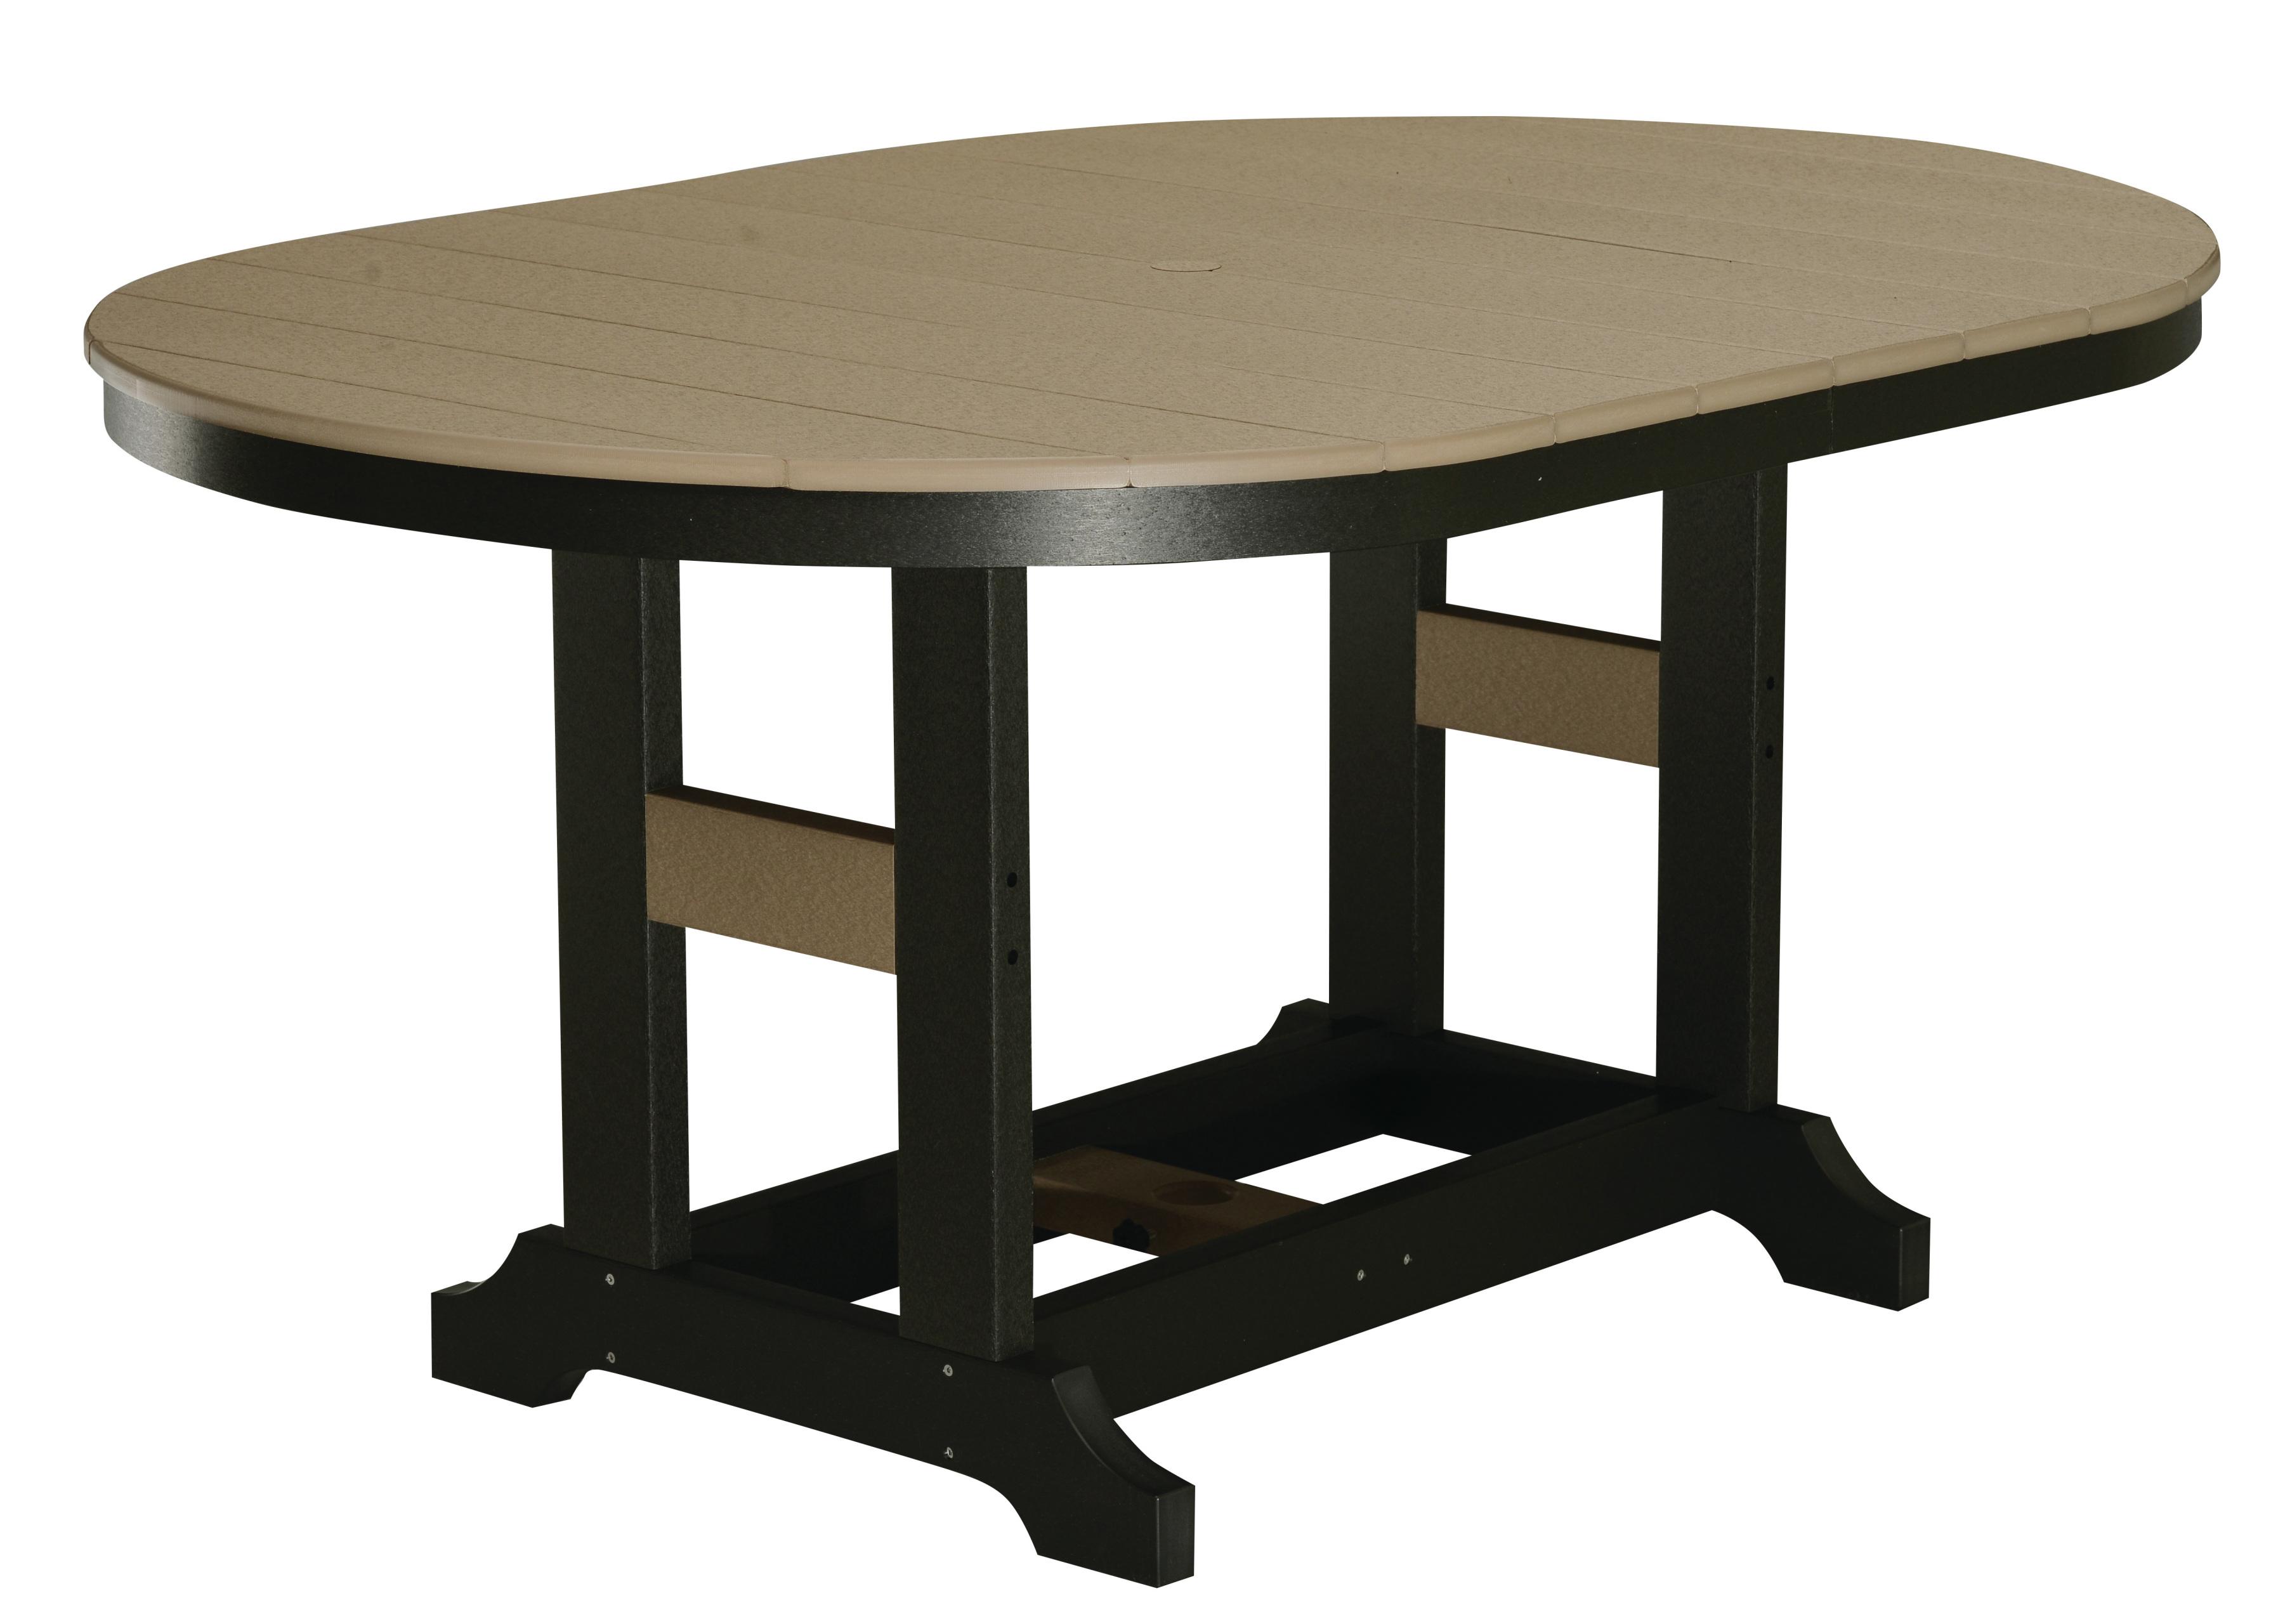 44 x 64 oblong dining table regular dining height for Table 6 handbook 44